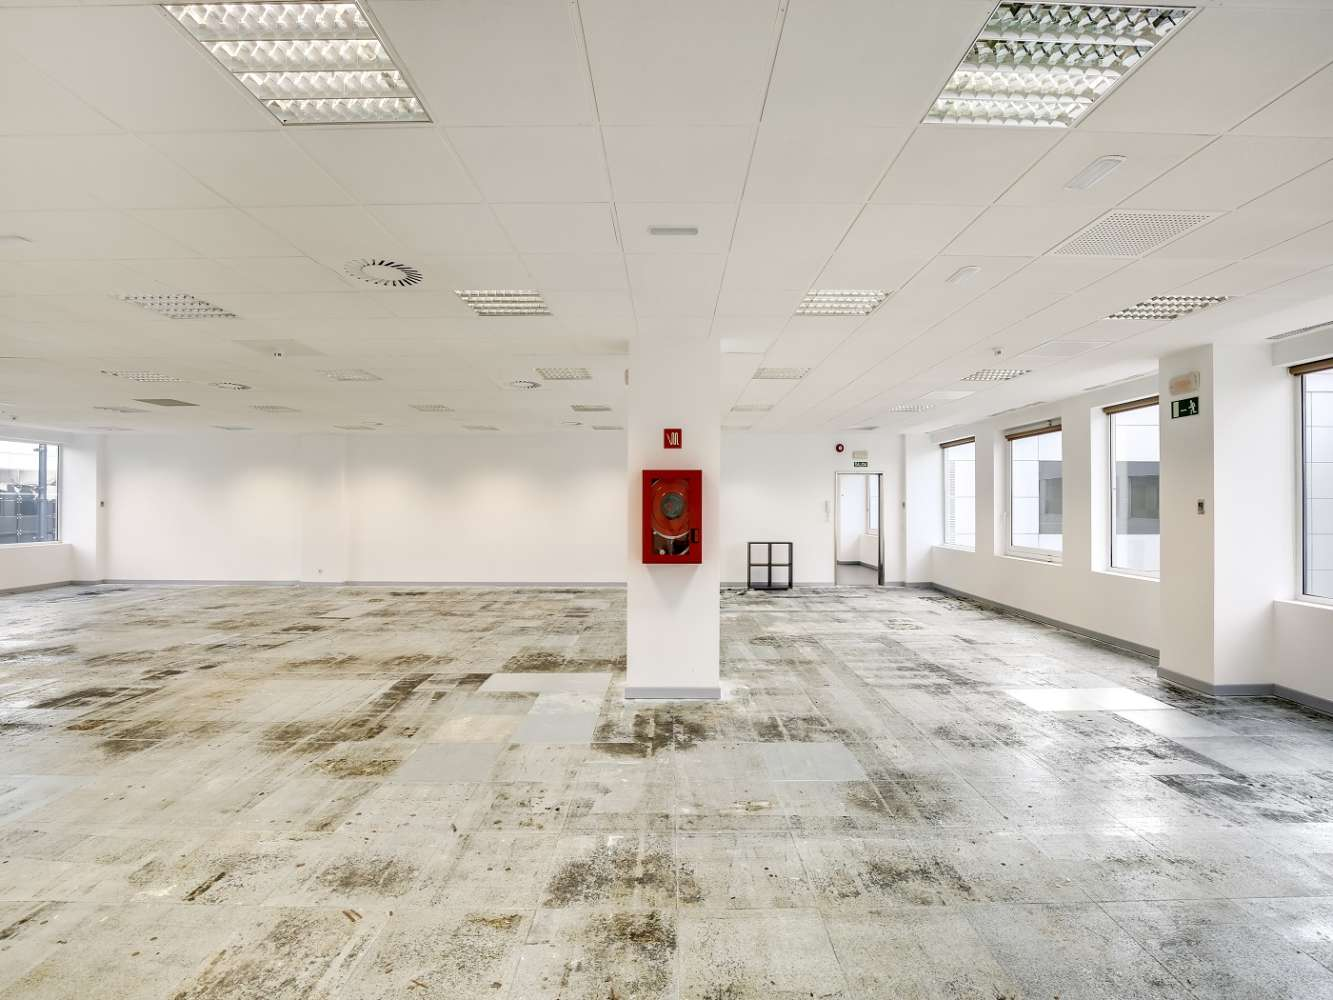 Oficina Las rozas de madrid, 28232 - Edificio 3. P.E. Alvia - 14358